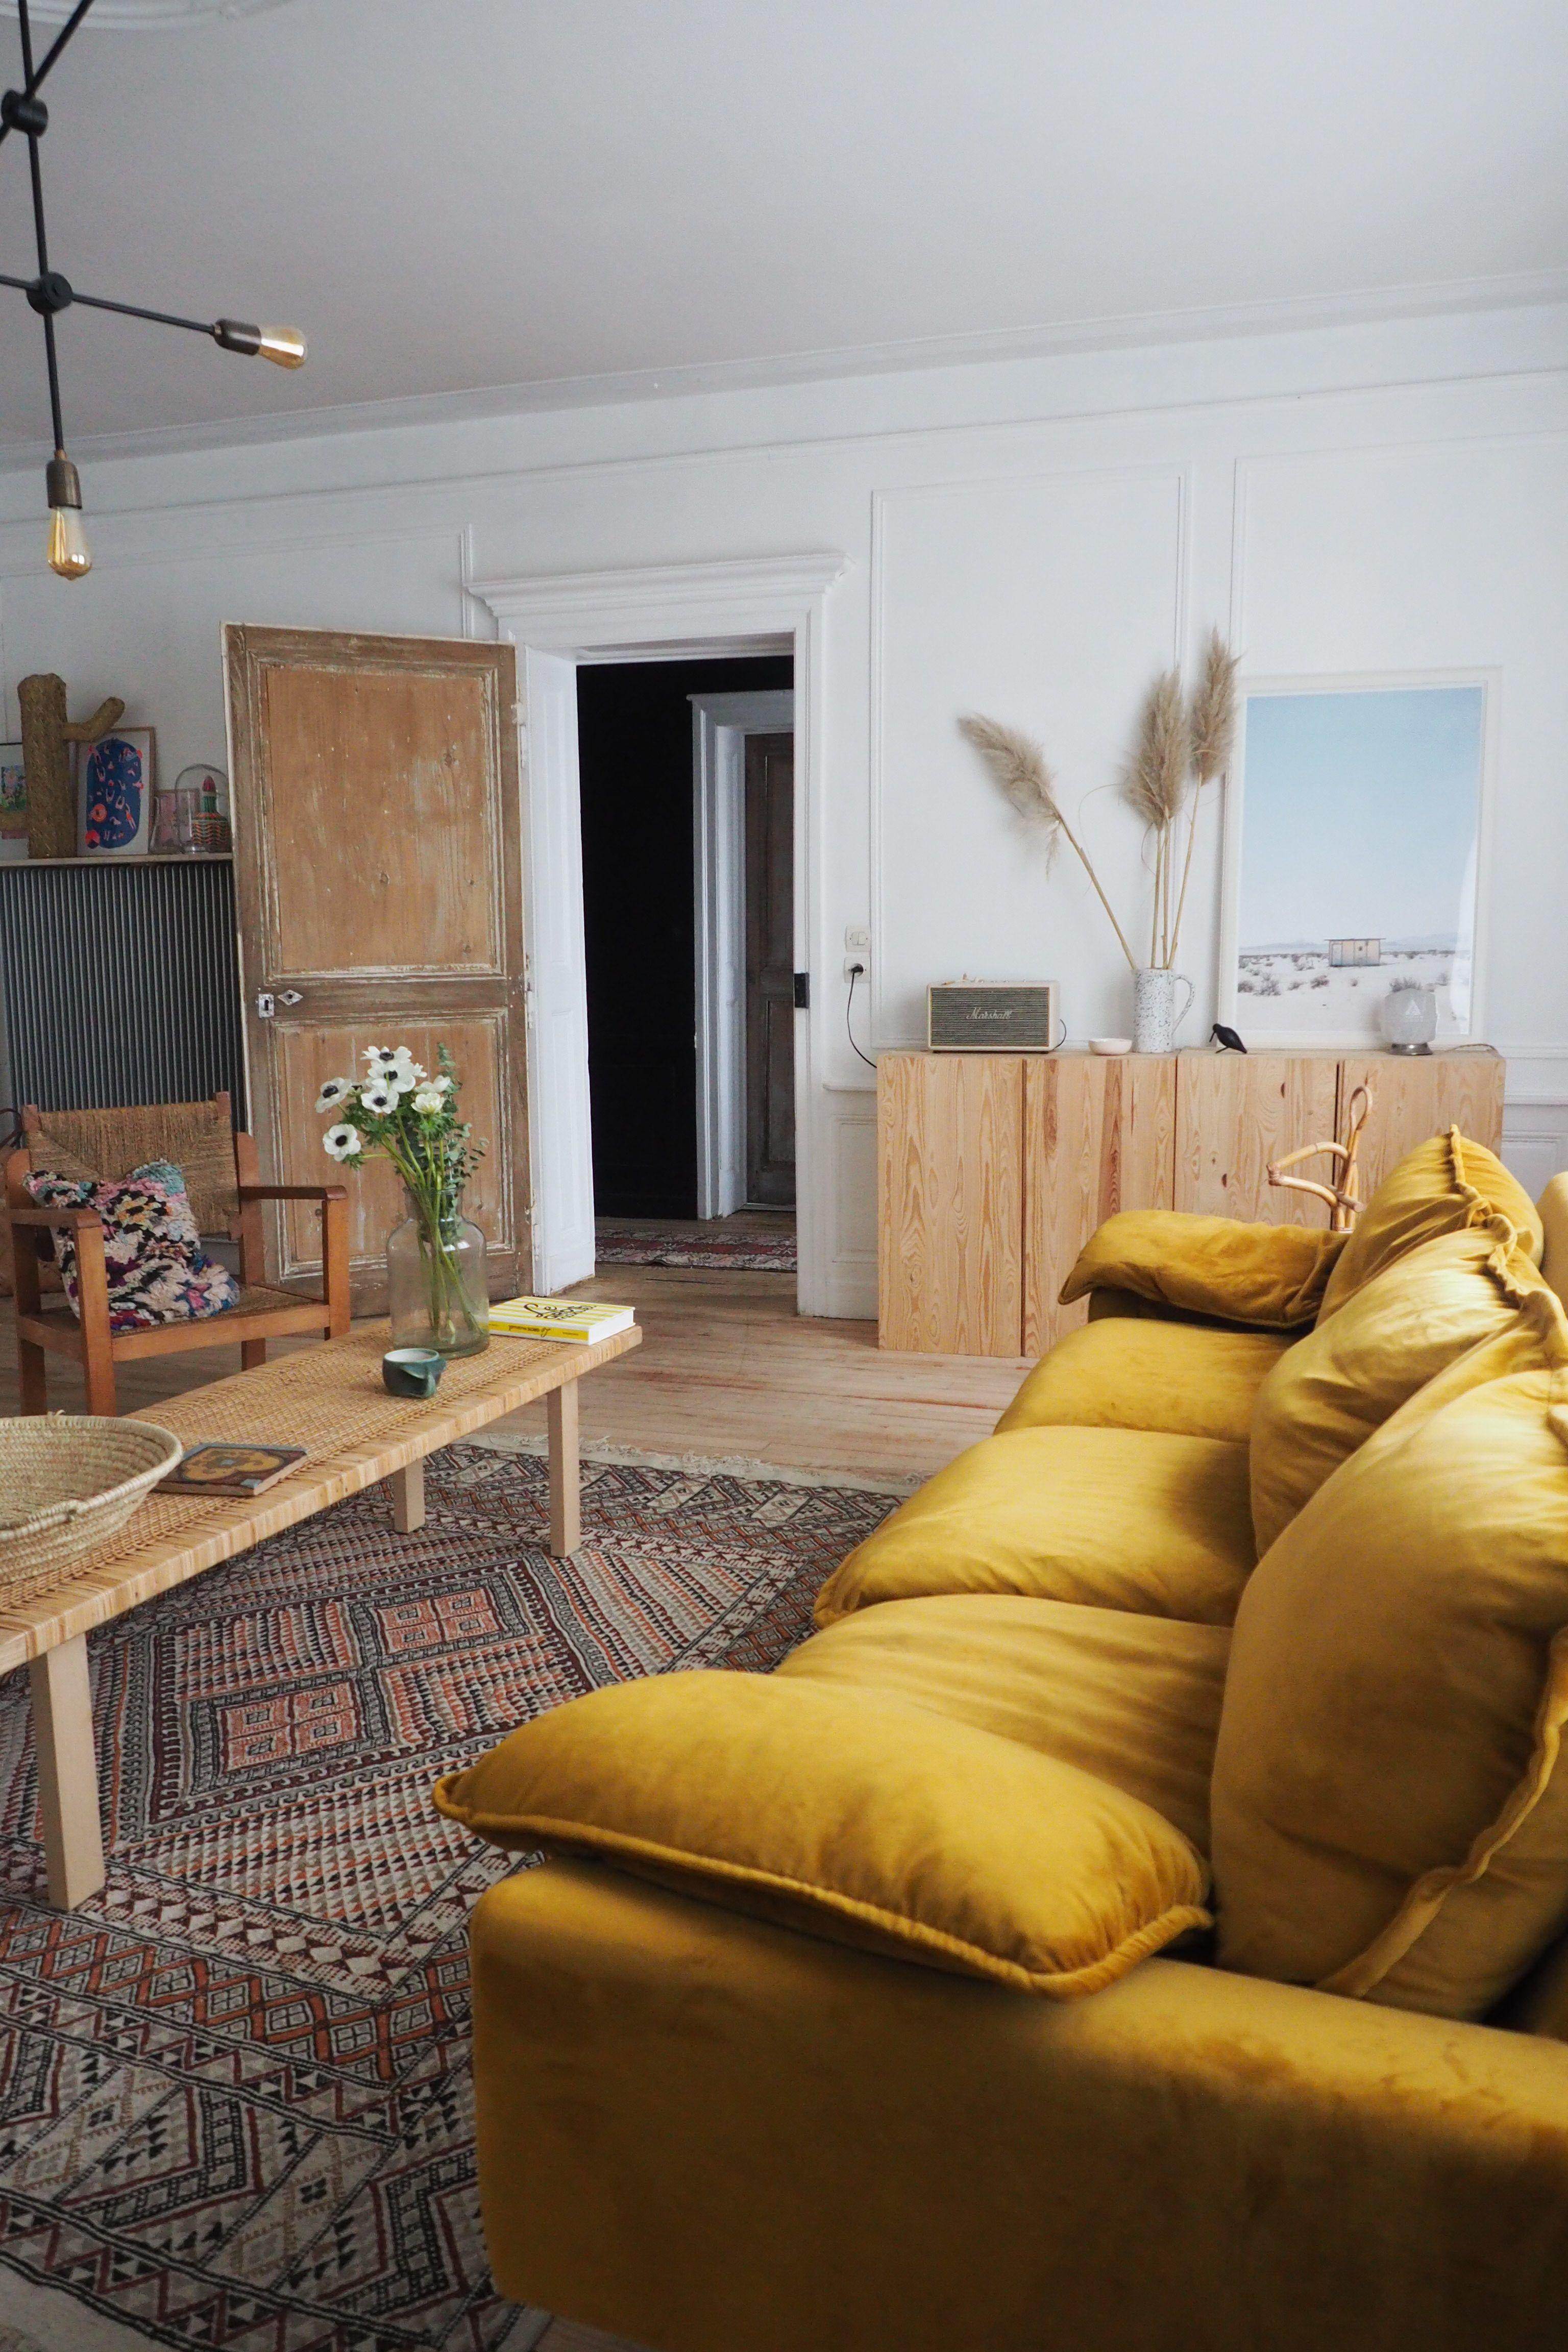 Une Maison Ancienne Renovee Hello Blogzine Blog Deco Lifestyle Www Hello Hello Fr Meuble De Cuisine Ikea Maison Maison Ancienne